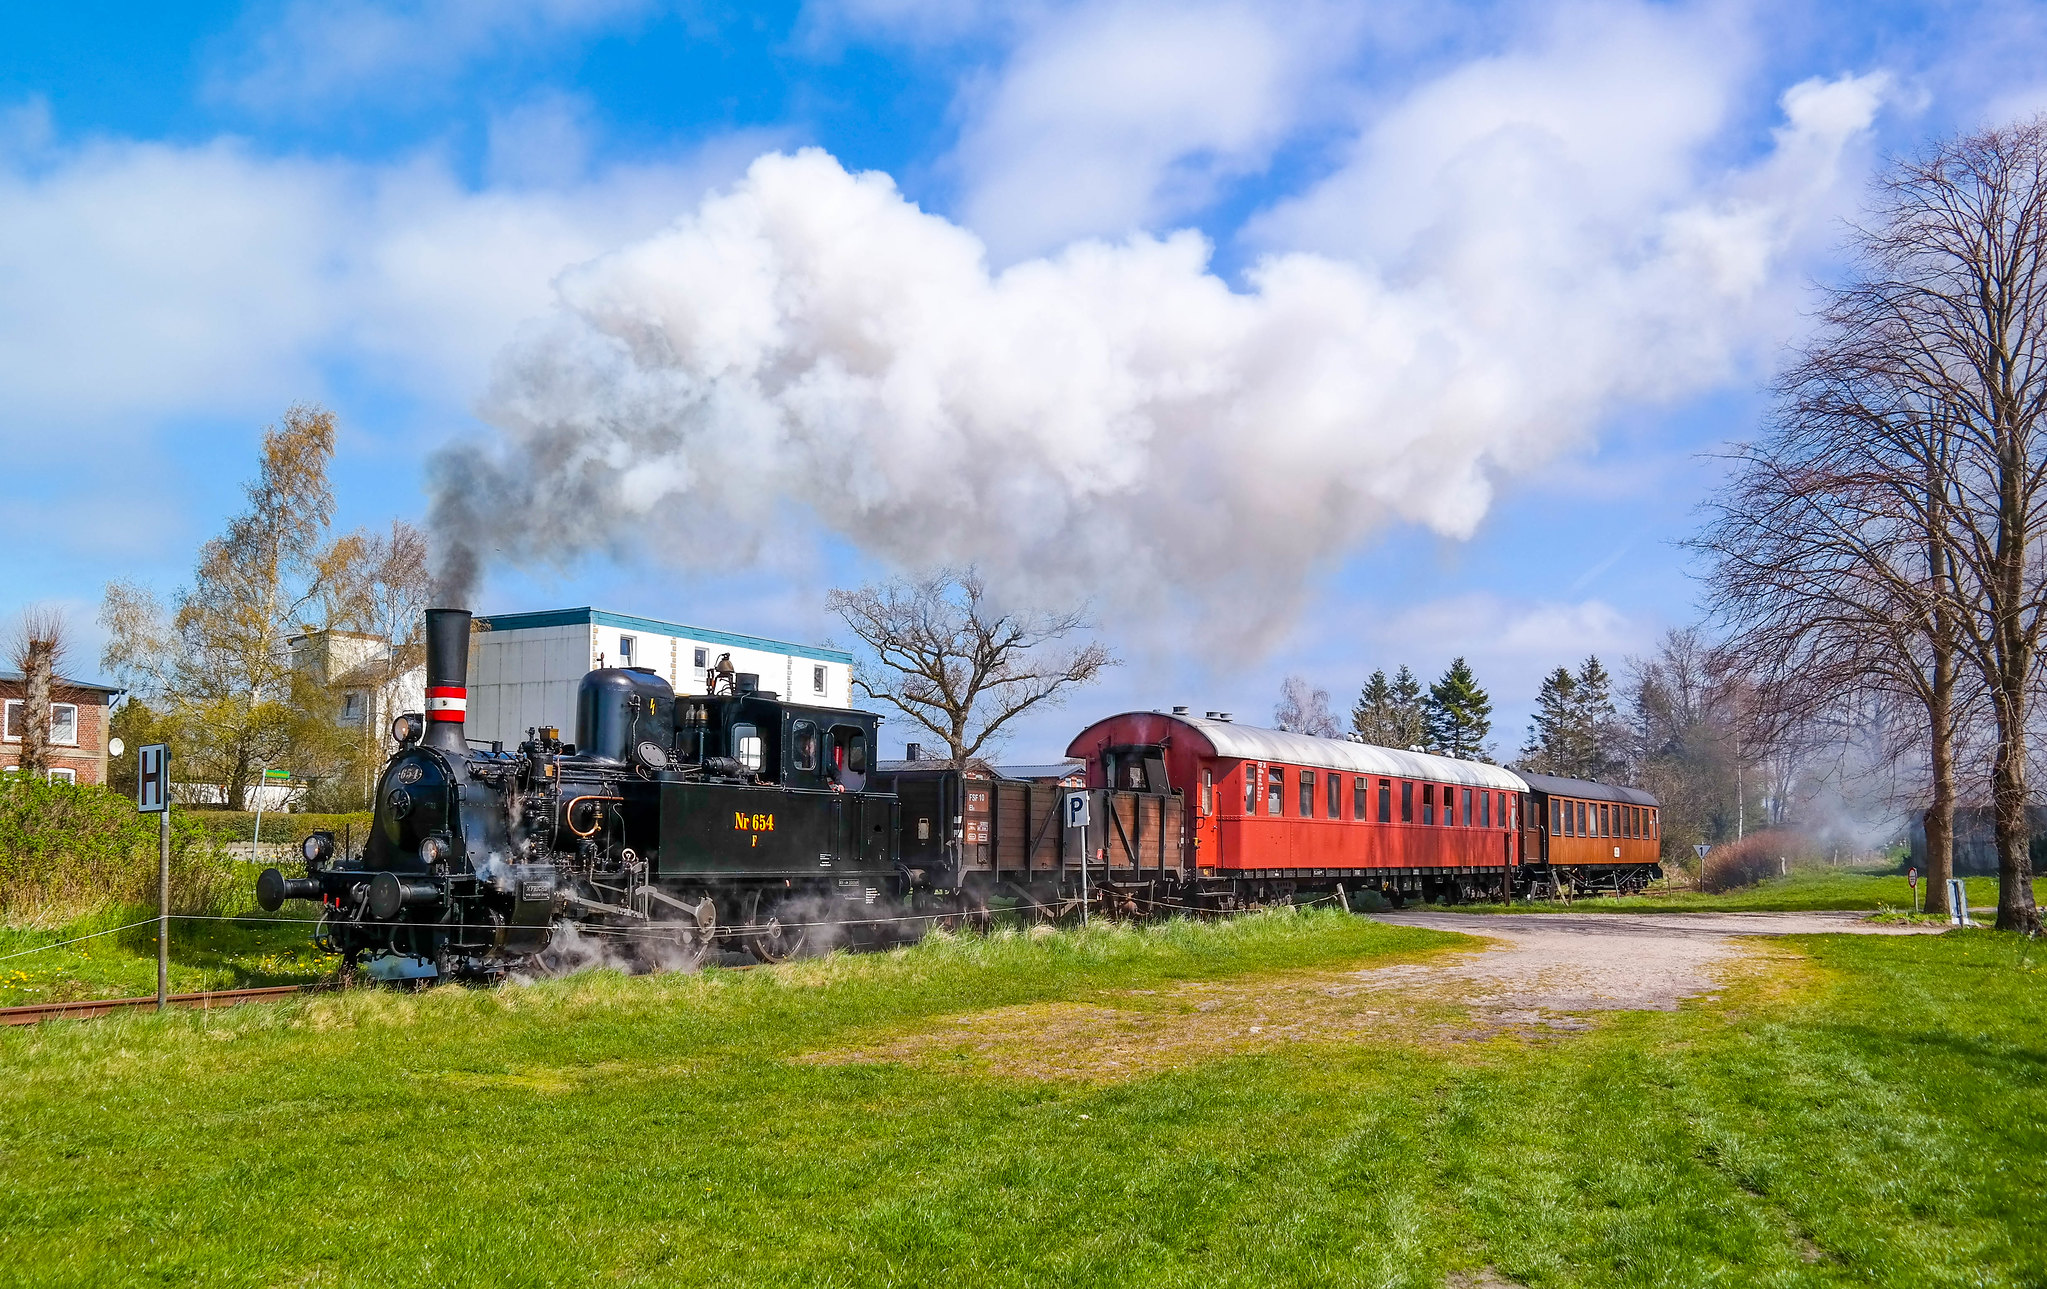 Angelner Dampfbahn, Northern Germany, 20